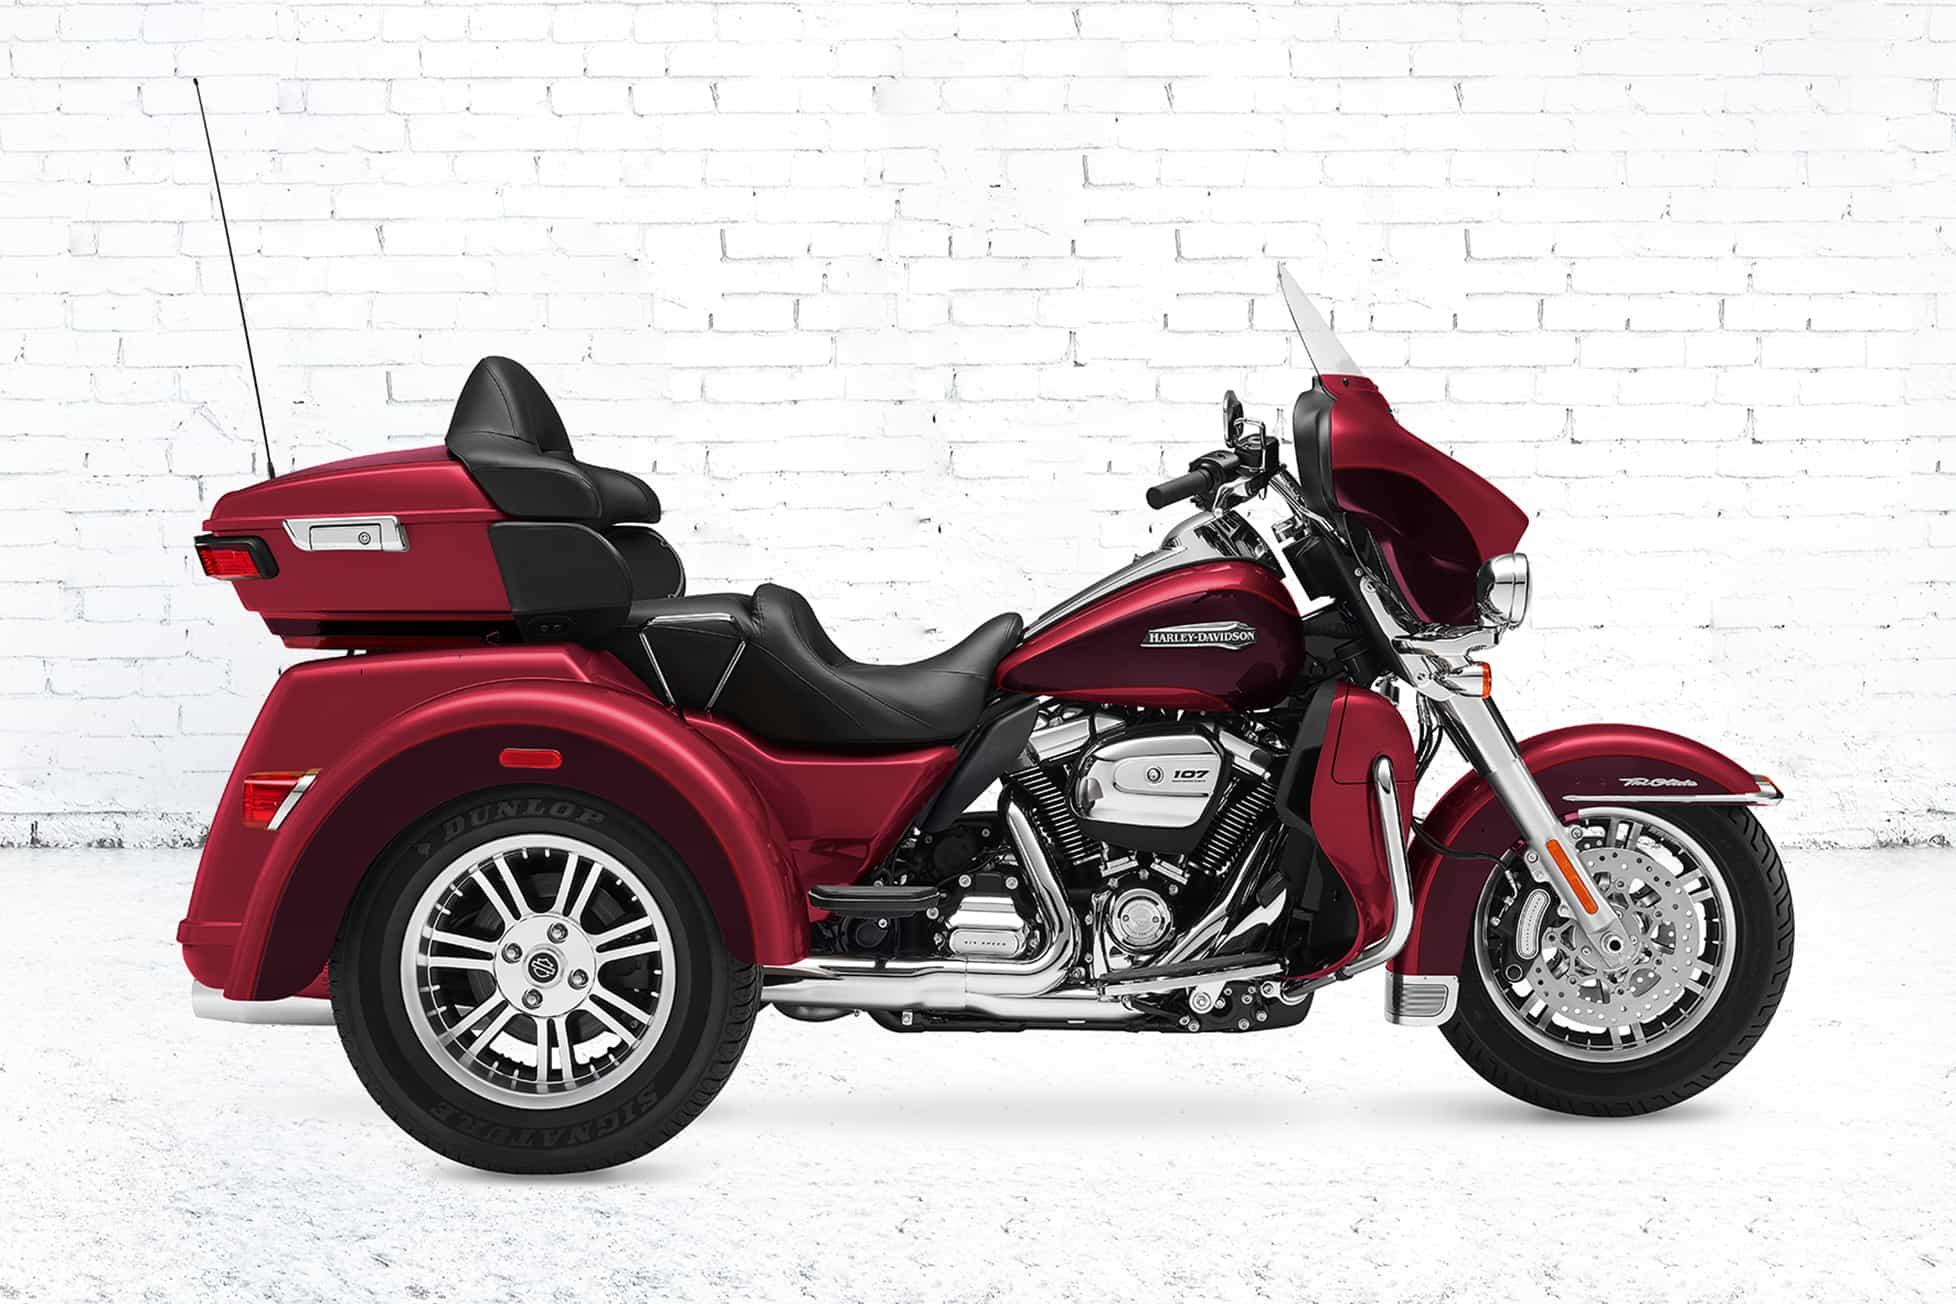 2014 Harley Davidson Triglide Wiring Diagram Automotive Circuit 2018 Harleydavidson Tri Glide Ultra Motorcycle At Hrqsolutions